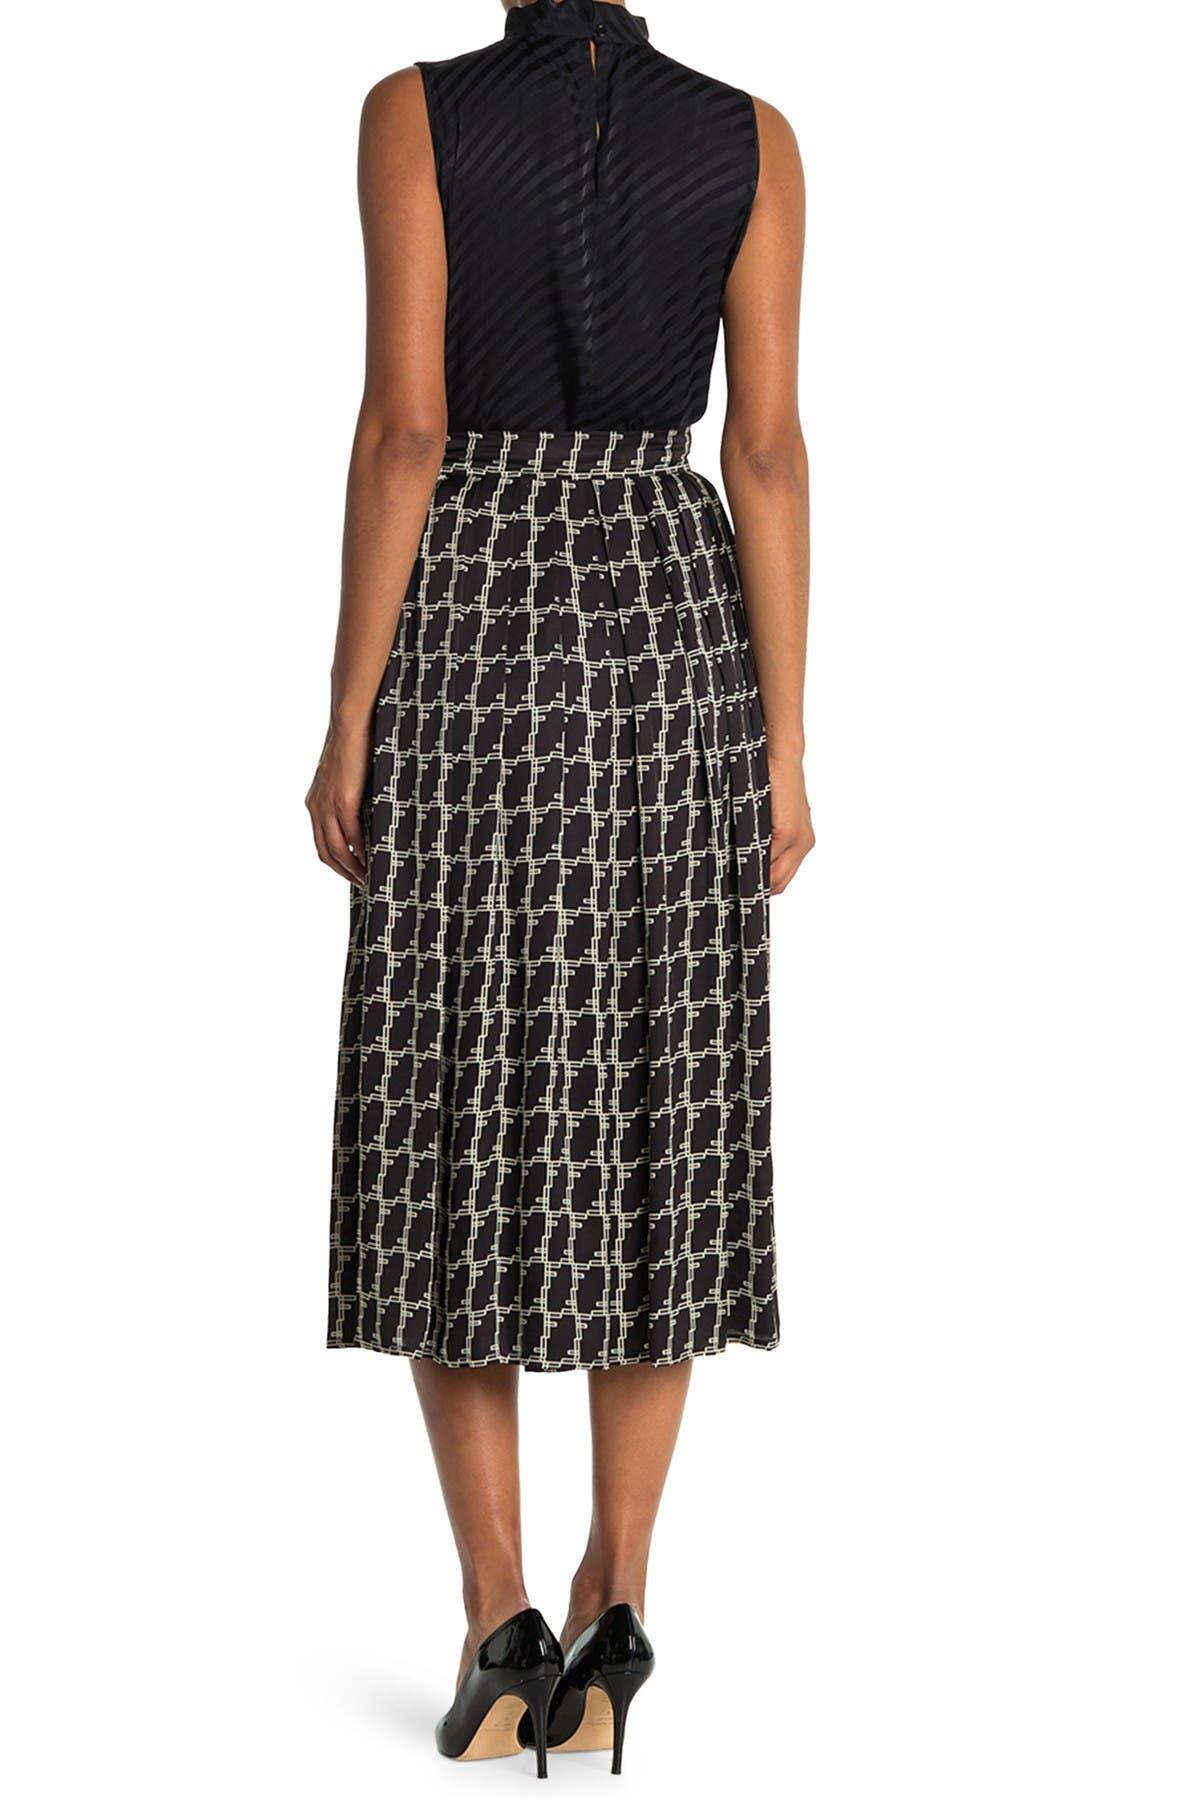 Image of SEVENTY VENEZIA Geometric Print Midi Skirt